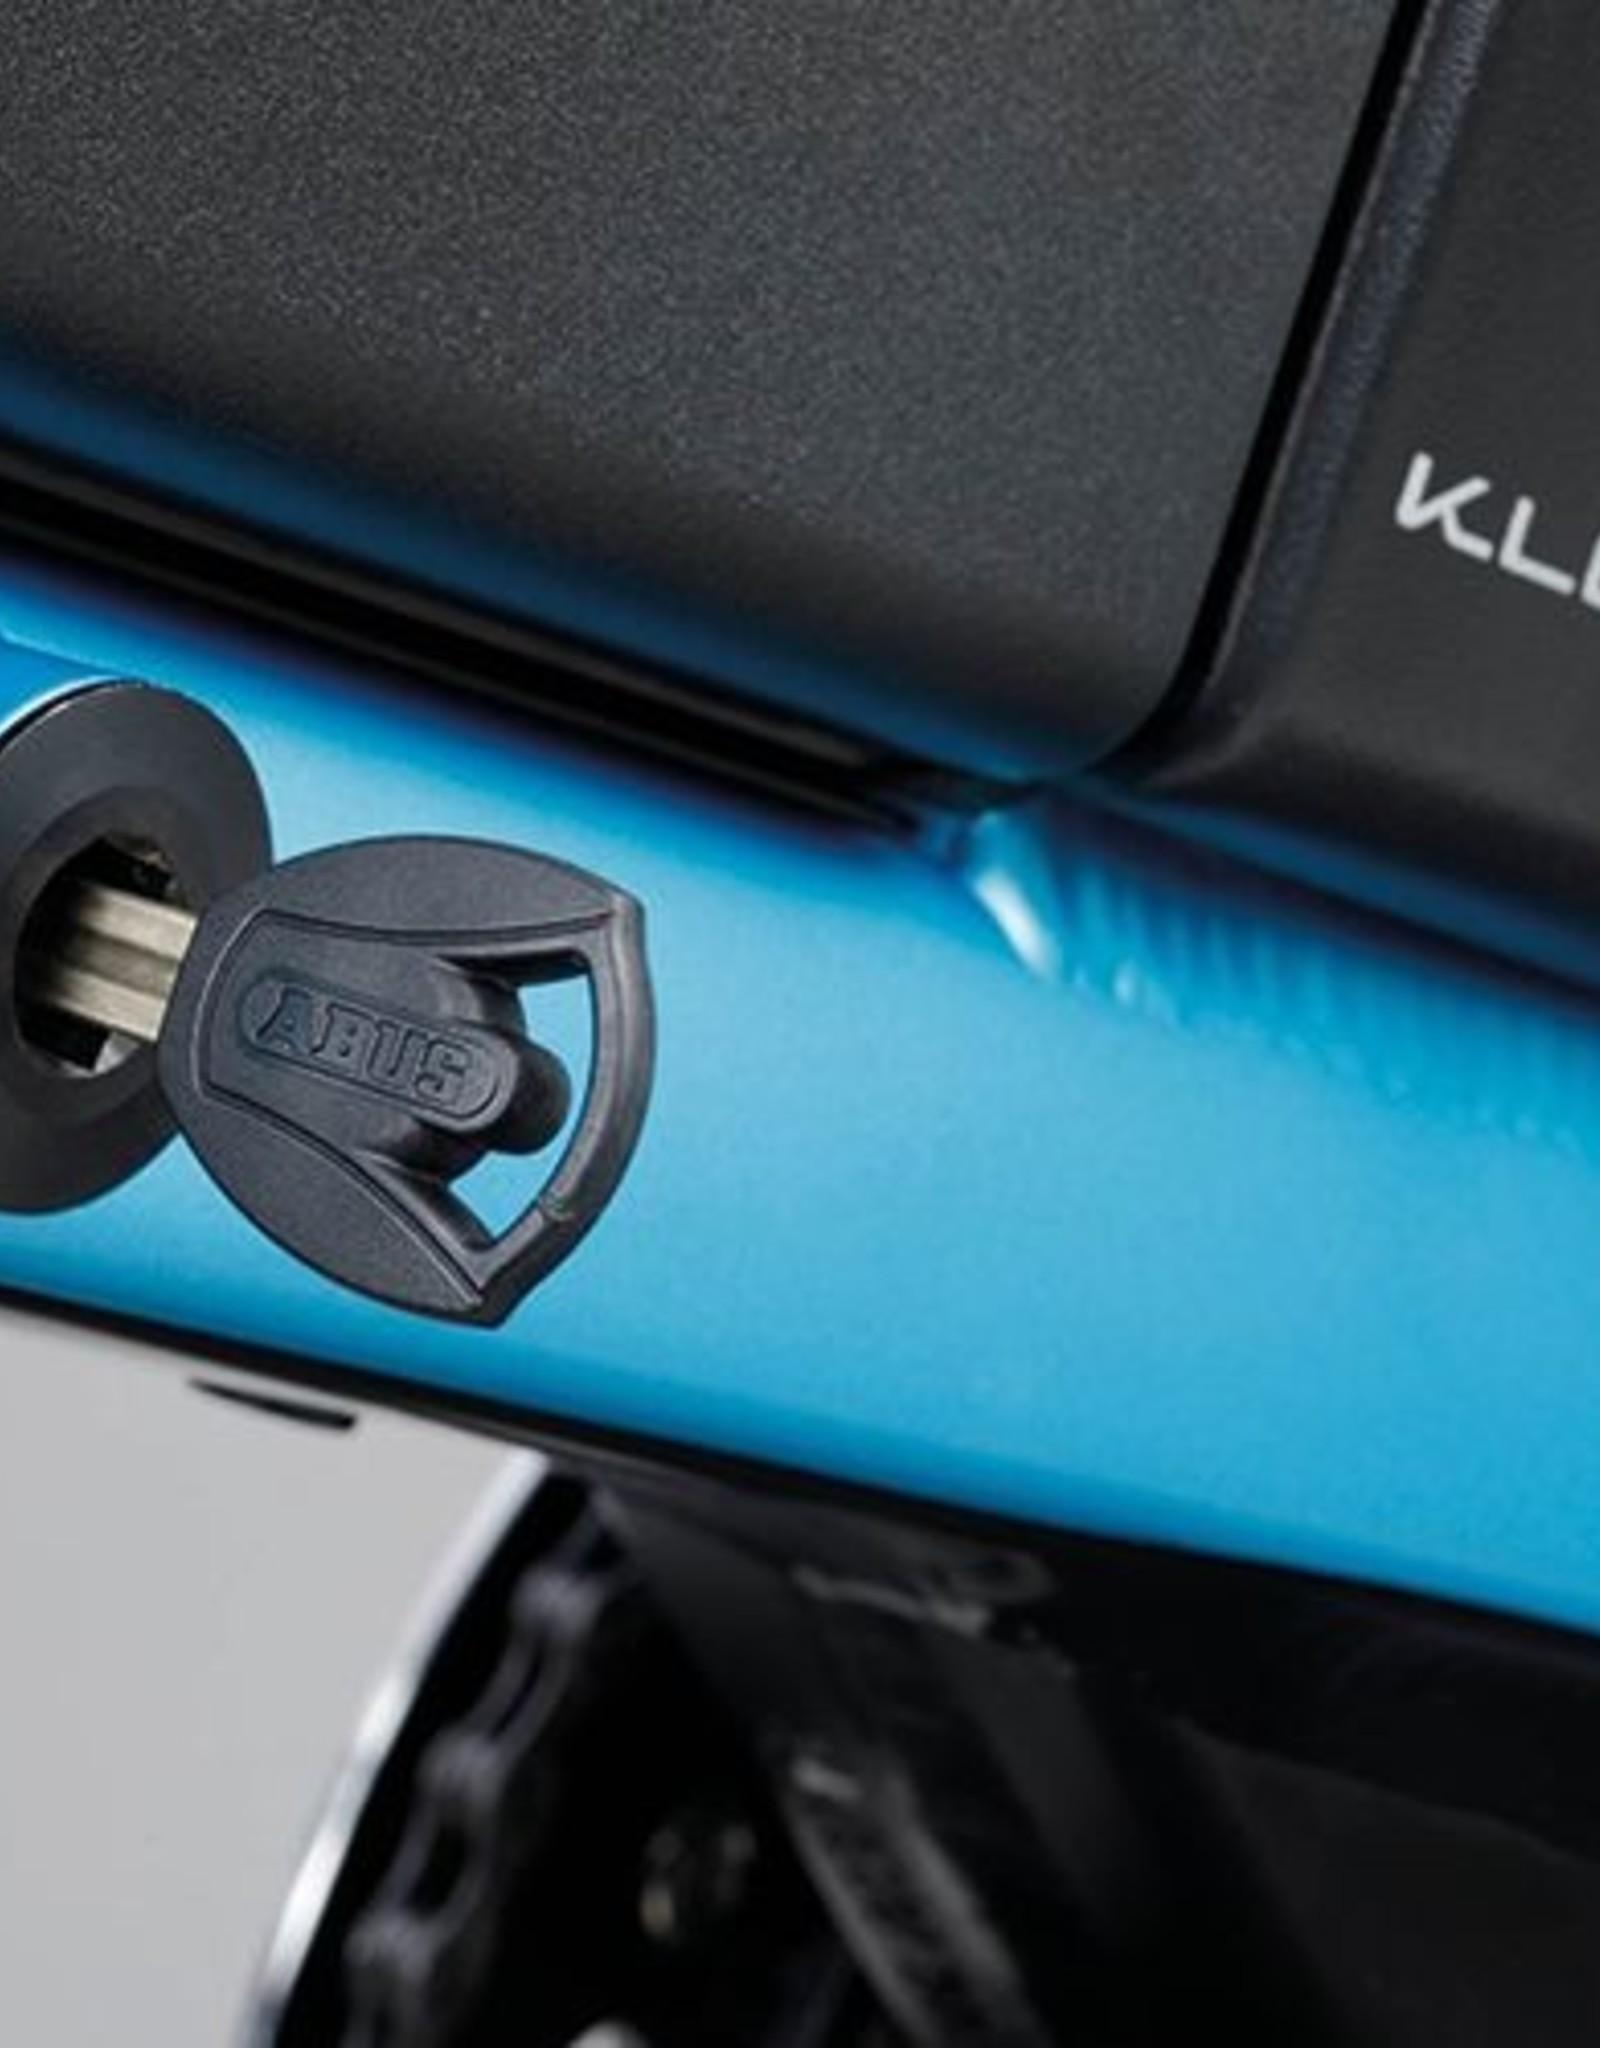 Klever X-power (Model 2019)